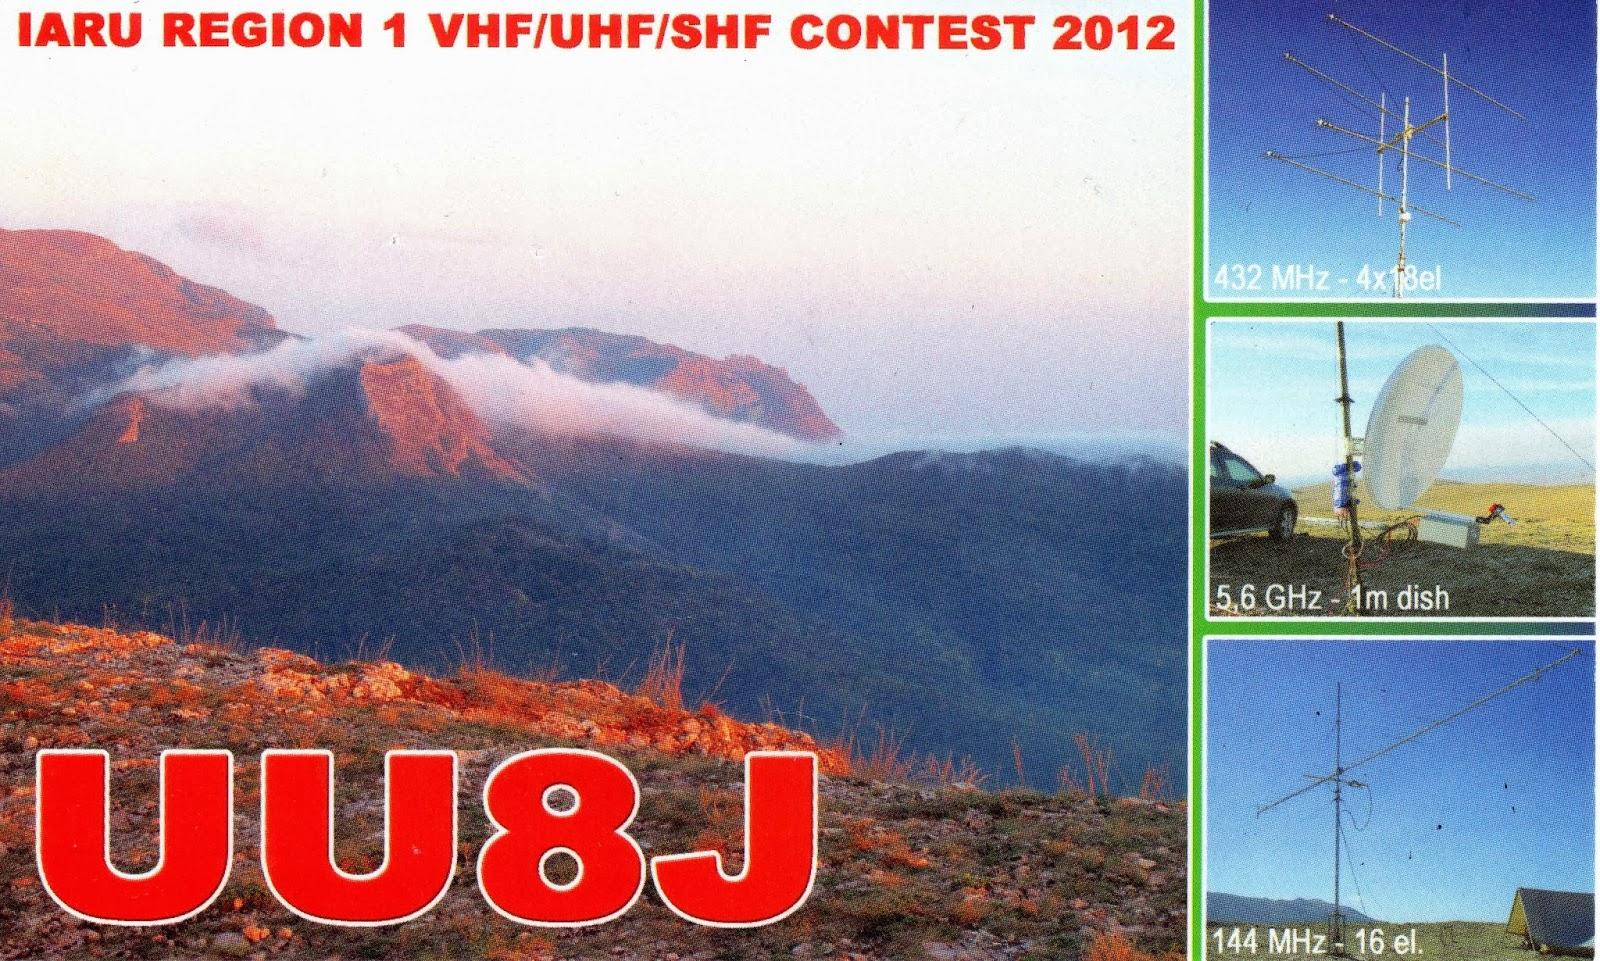 Нажмите на изображение для увеличения.  Название:UU8J_front-1.jpeg Просмотров:133 Размер:550.3 Кб ID:150989